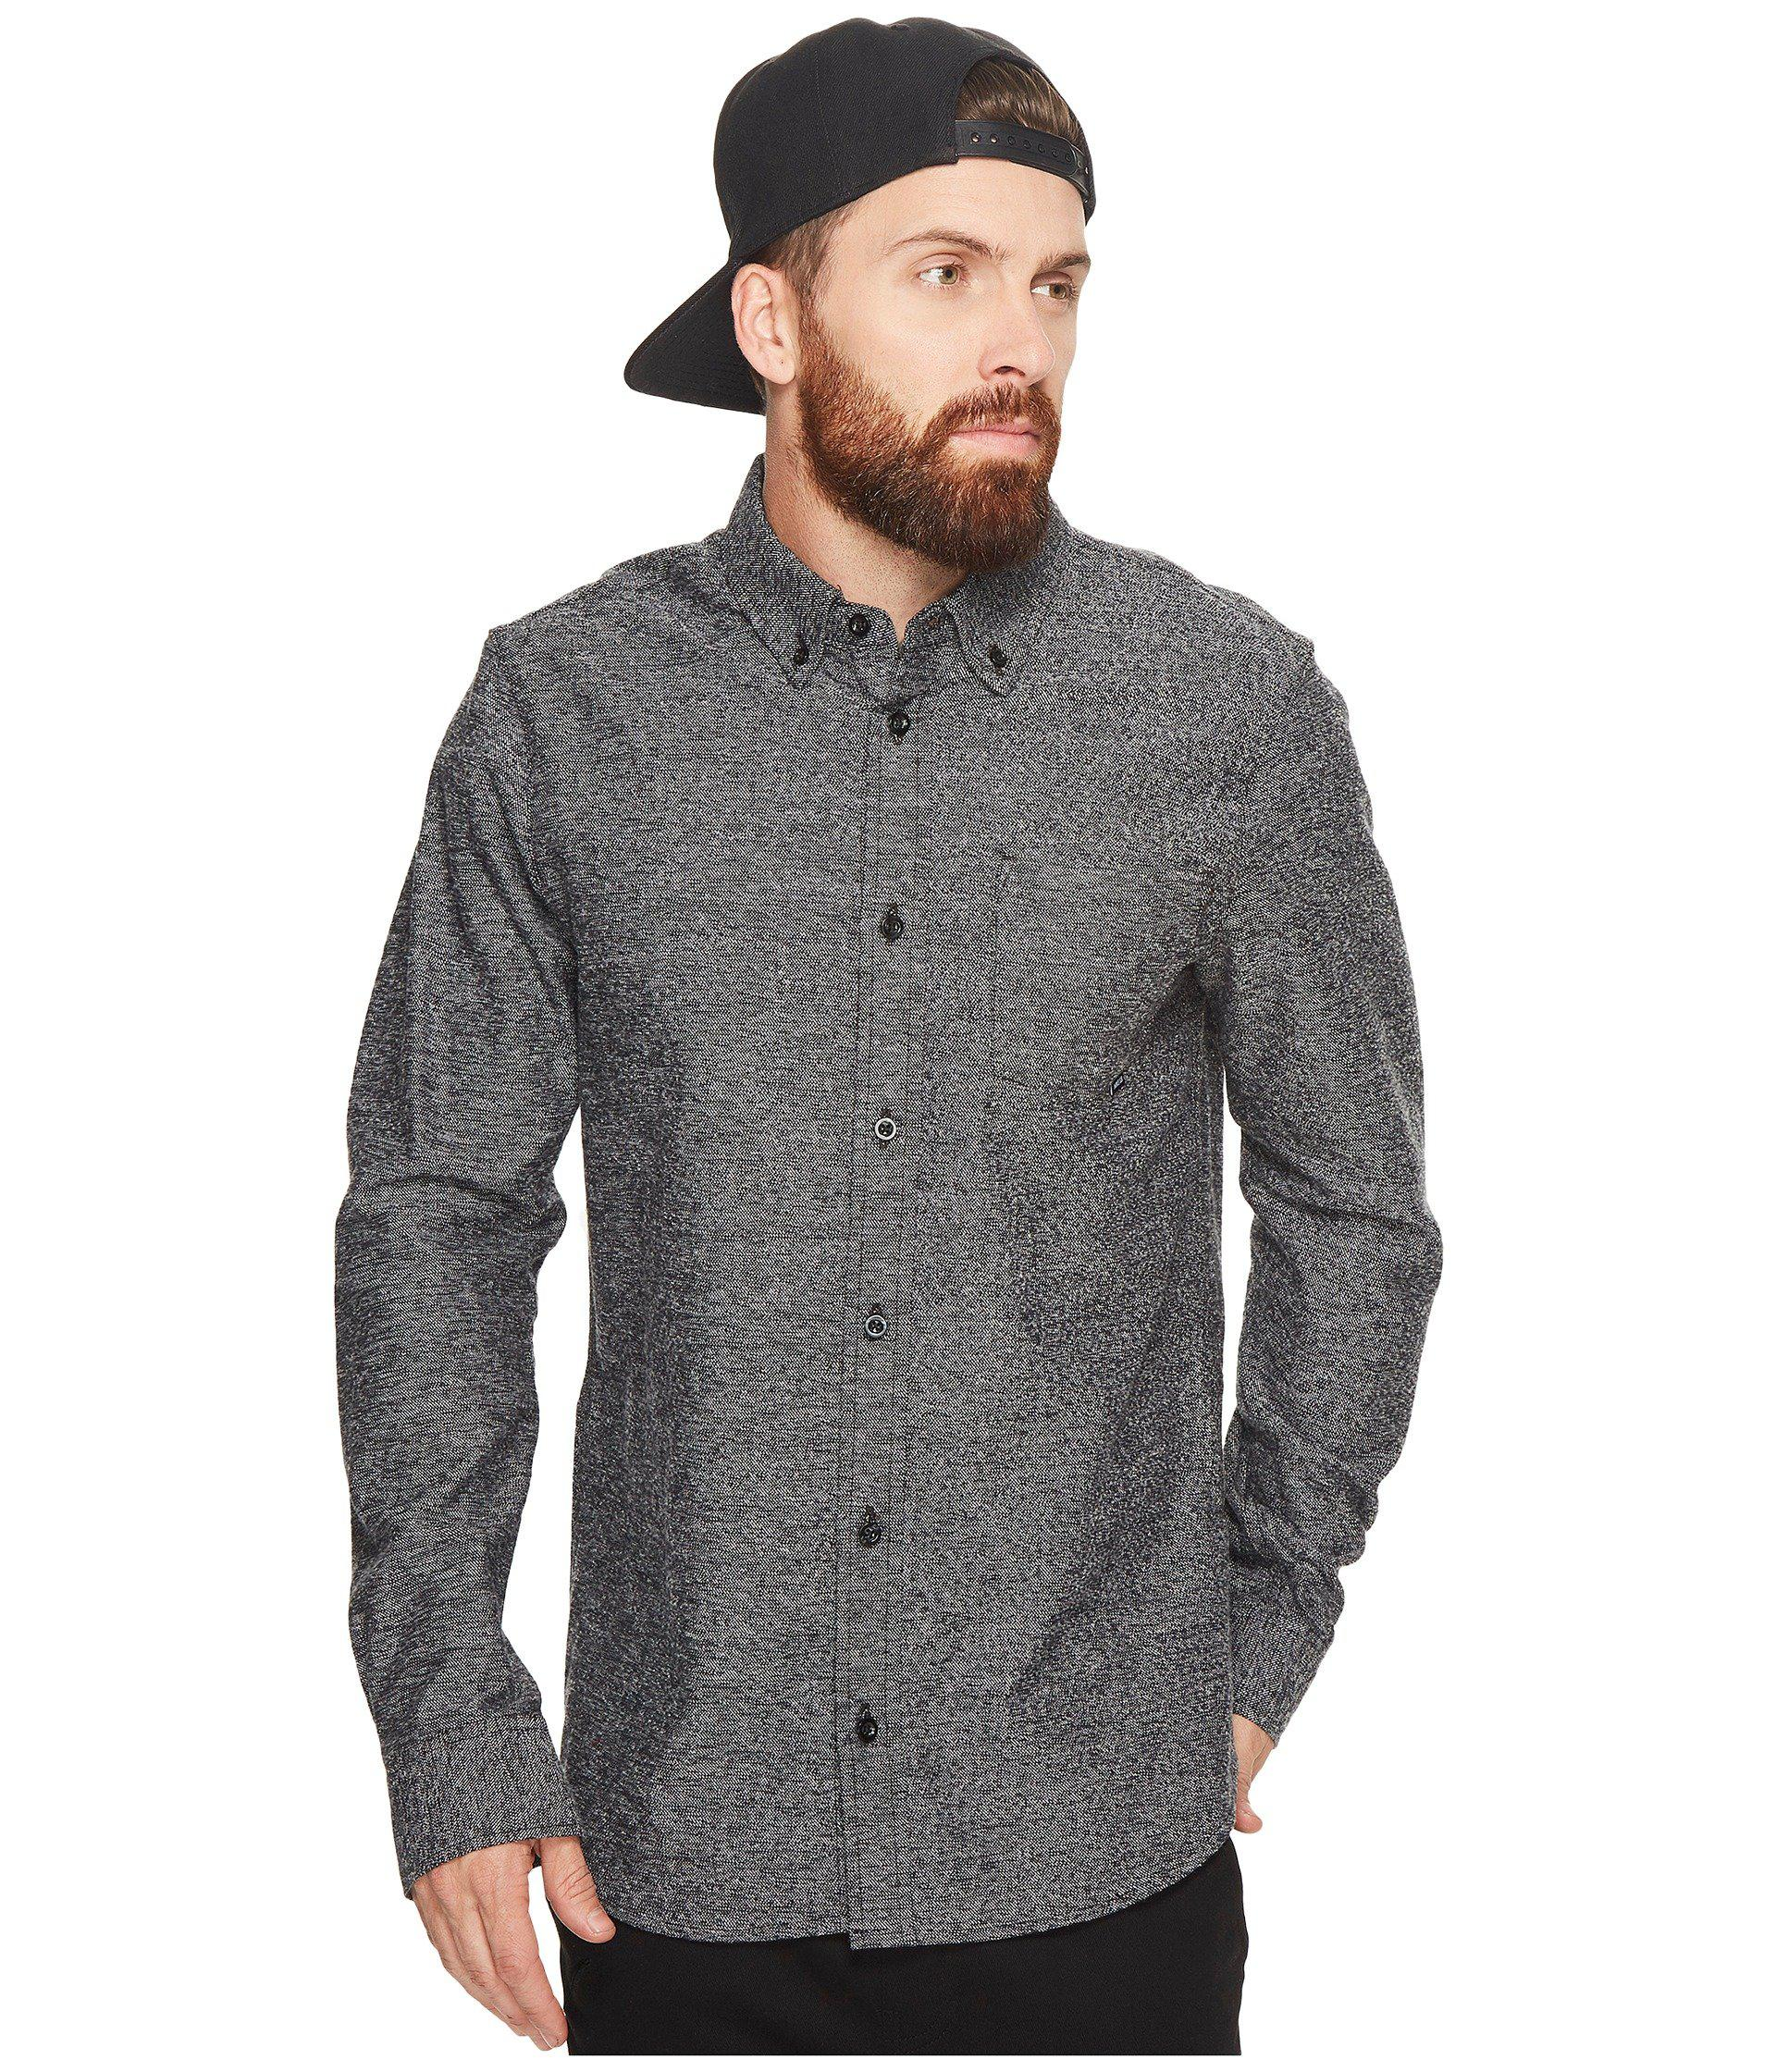 9981507a8bfa9 Lyst - Nike Sb Flex Button-up Top in Black for Men